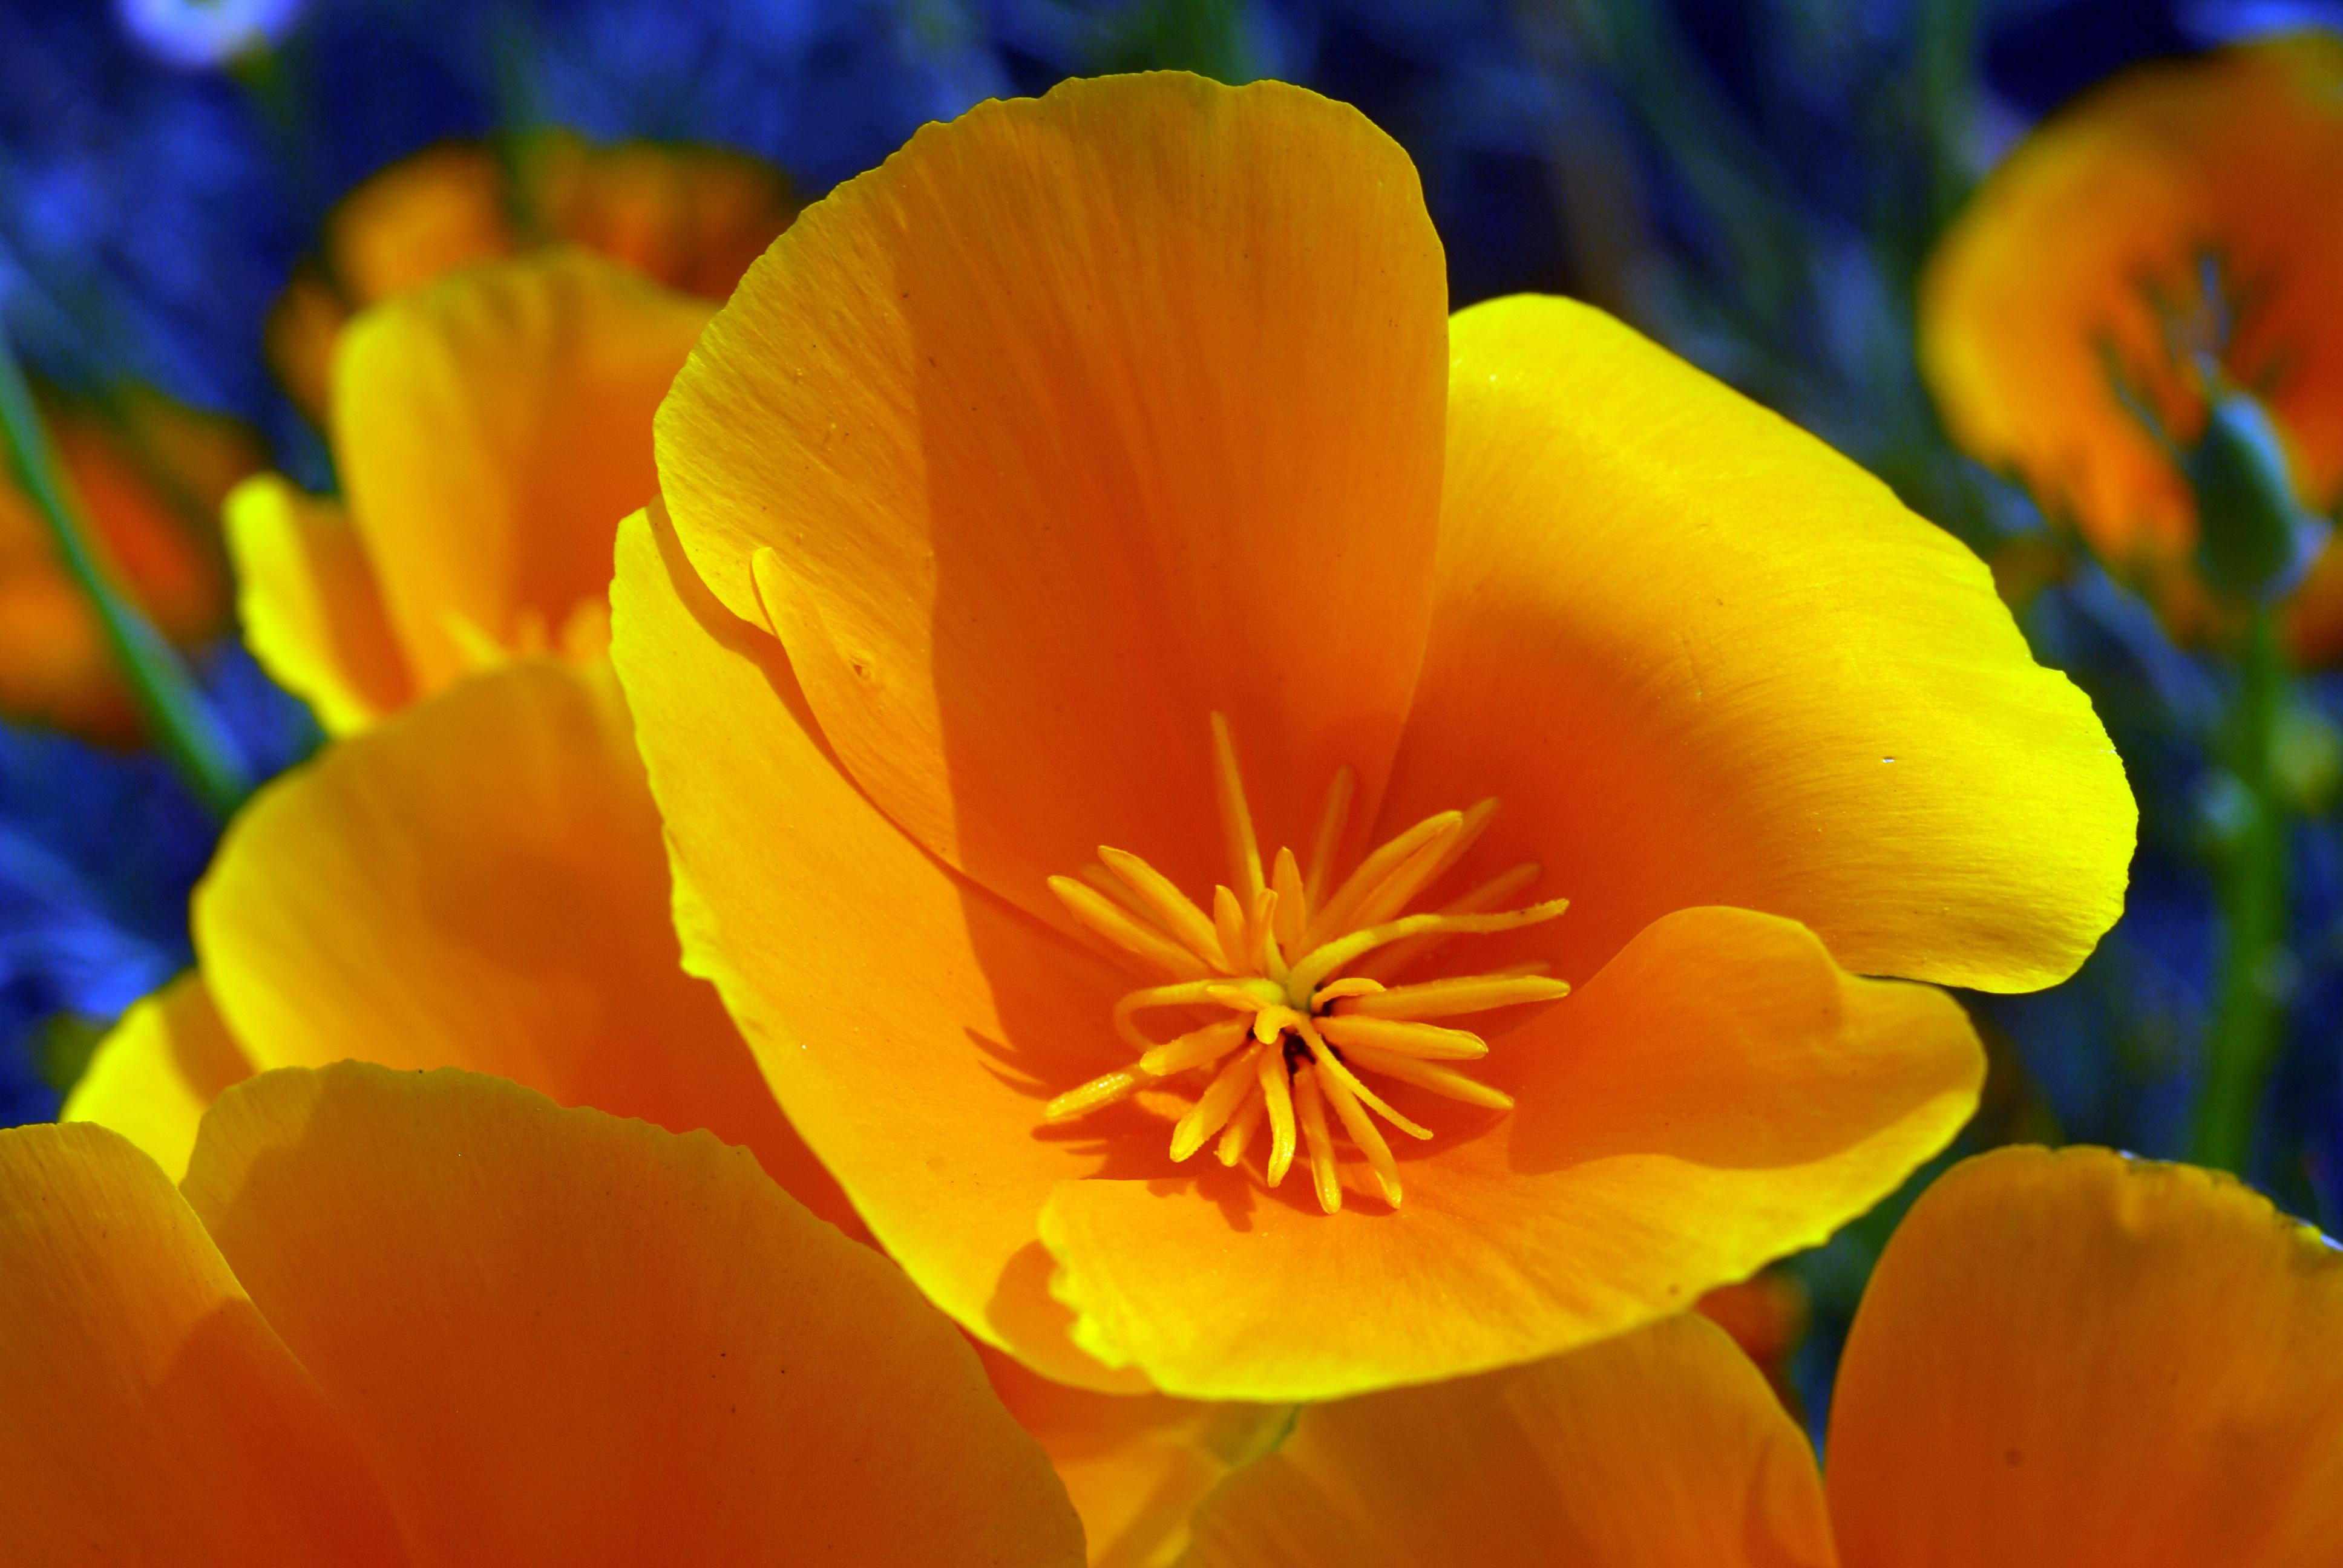 daffodils, flowers, nature, flower essences